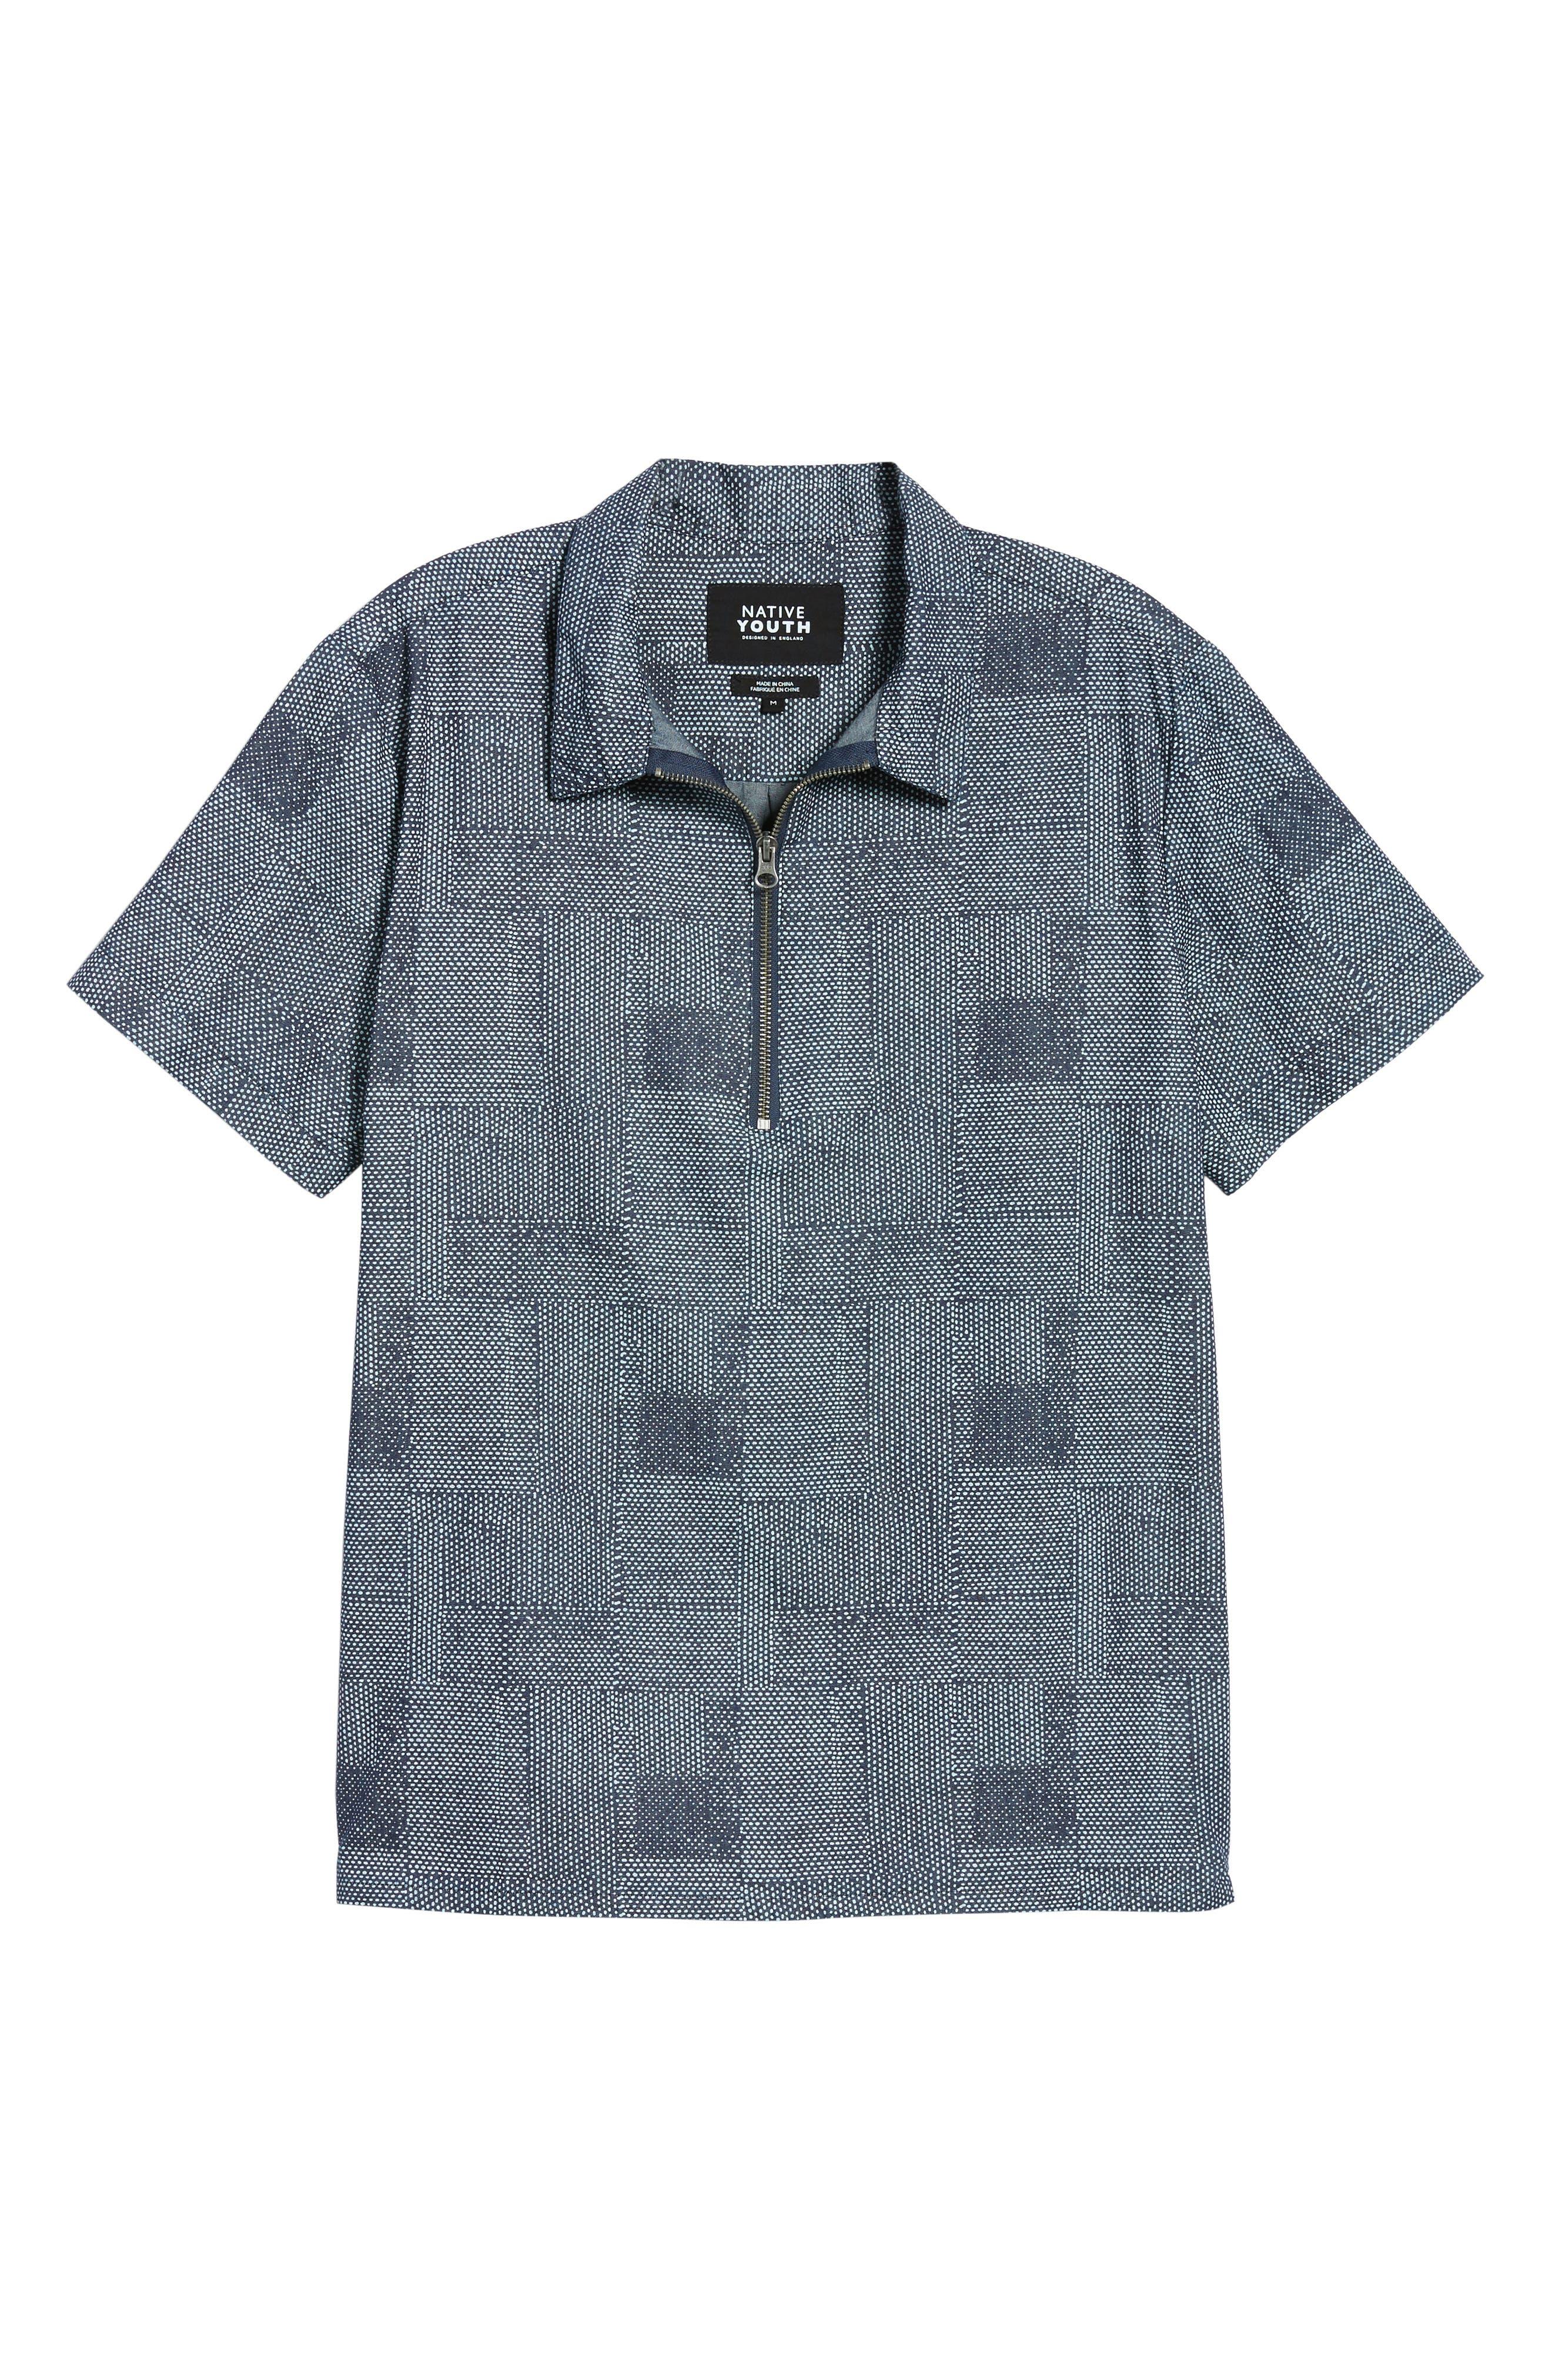 Dotpatch Woven Shirt,                             Alternate thumbnail 6, color,                             INDIGO